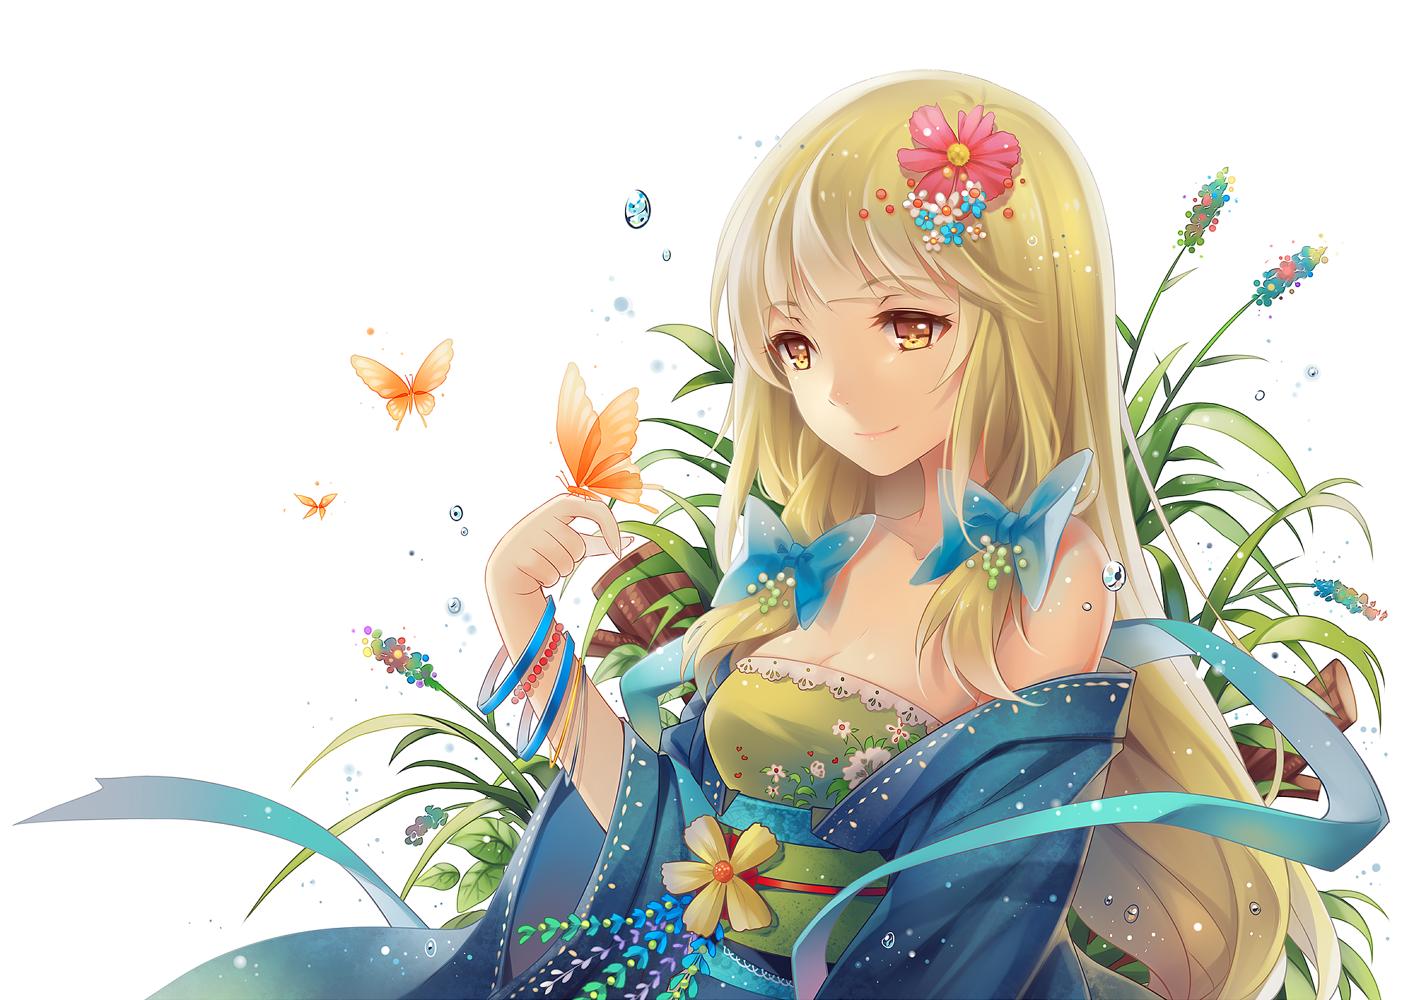 Blonde anime hair girl